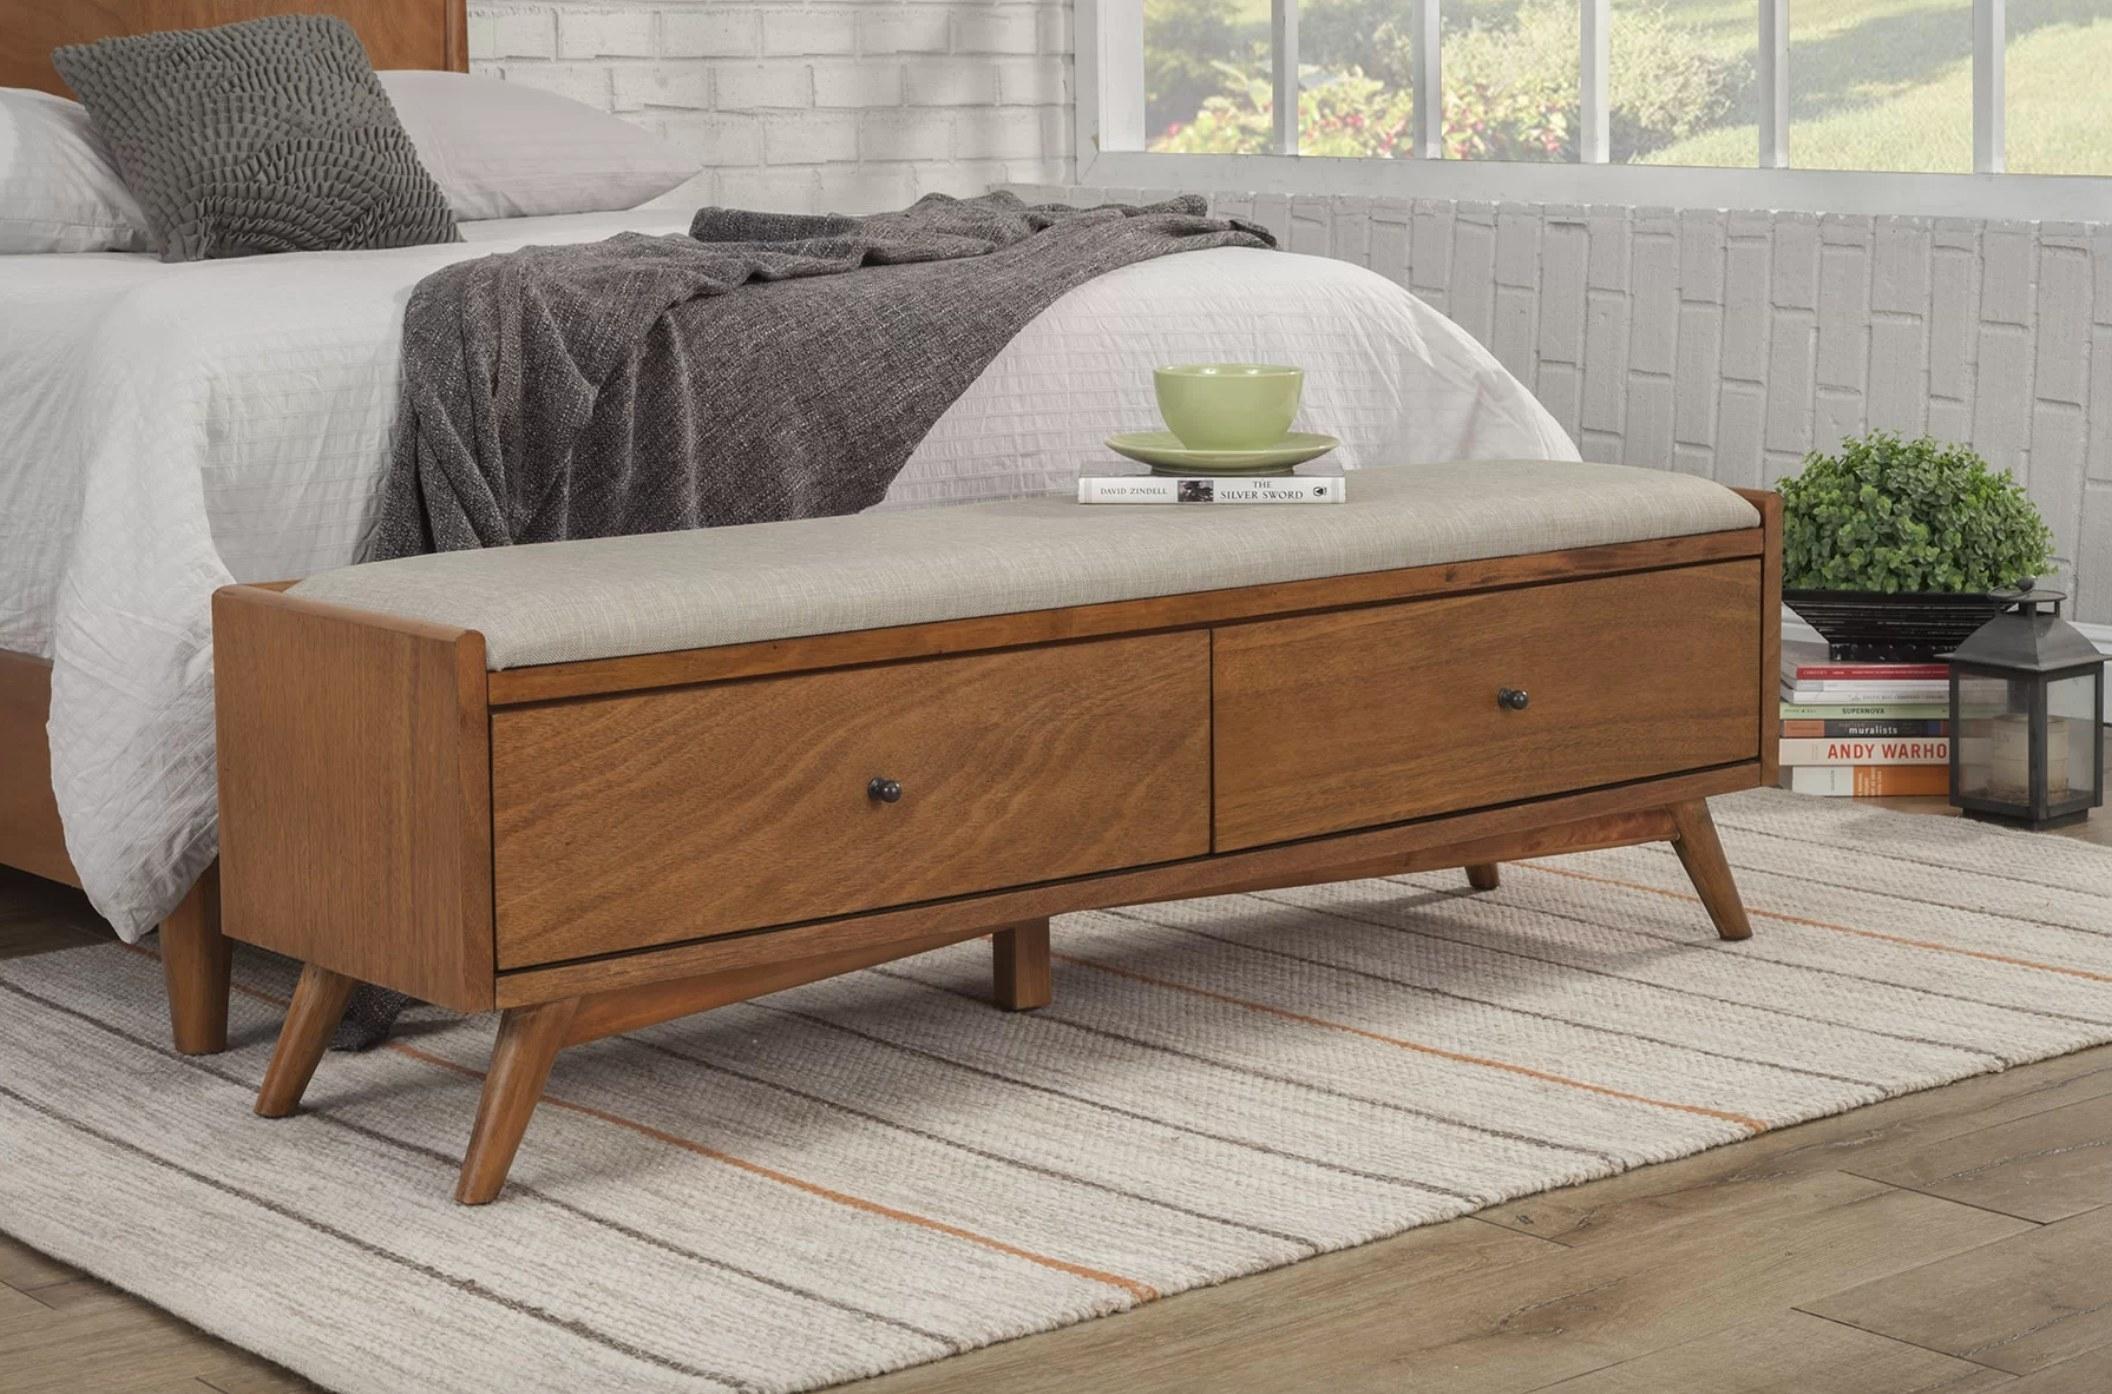 The brown wood drawer storage bench